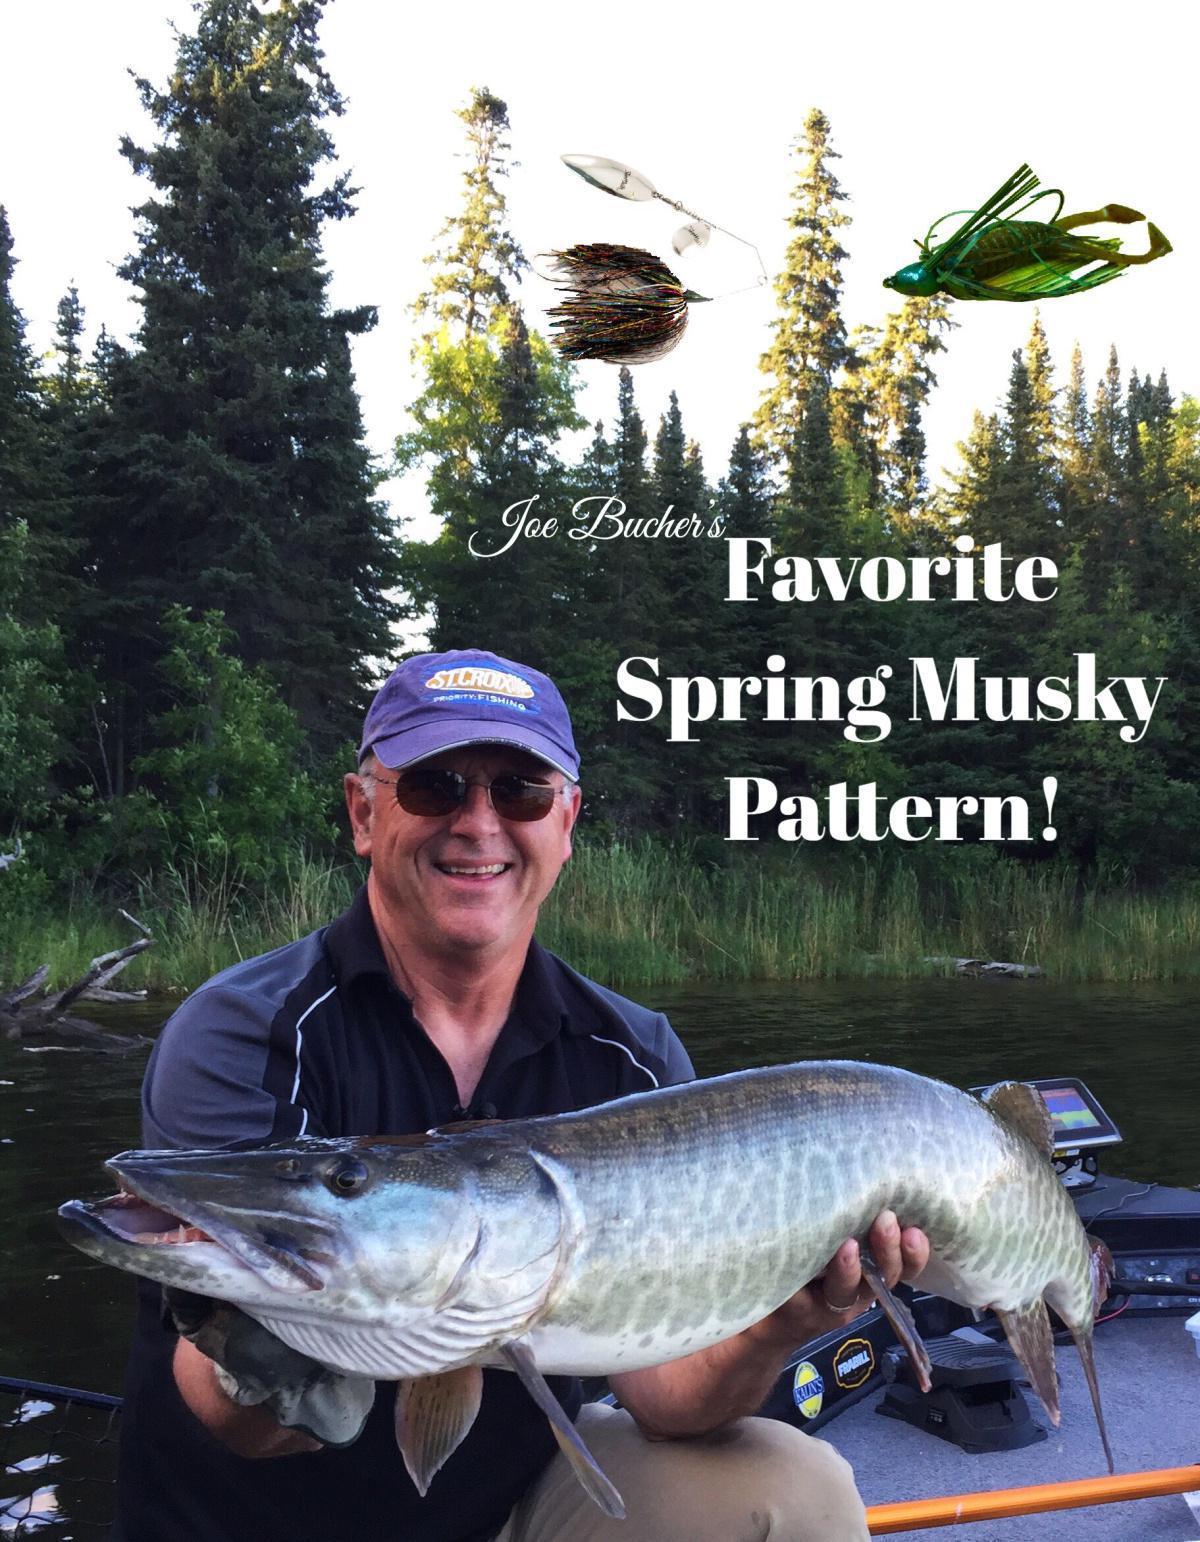 Joe's Favorite Spring Musky Pattern